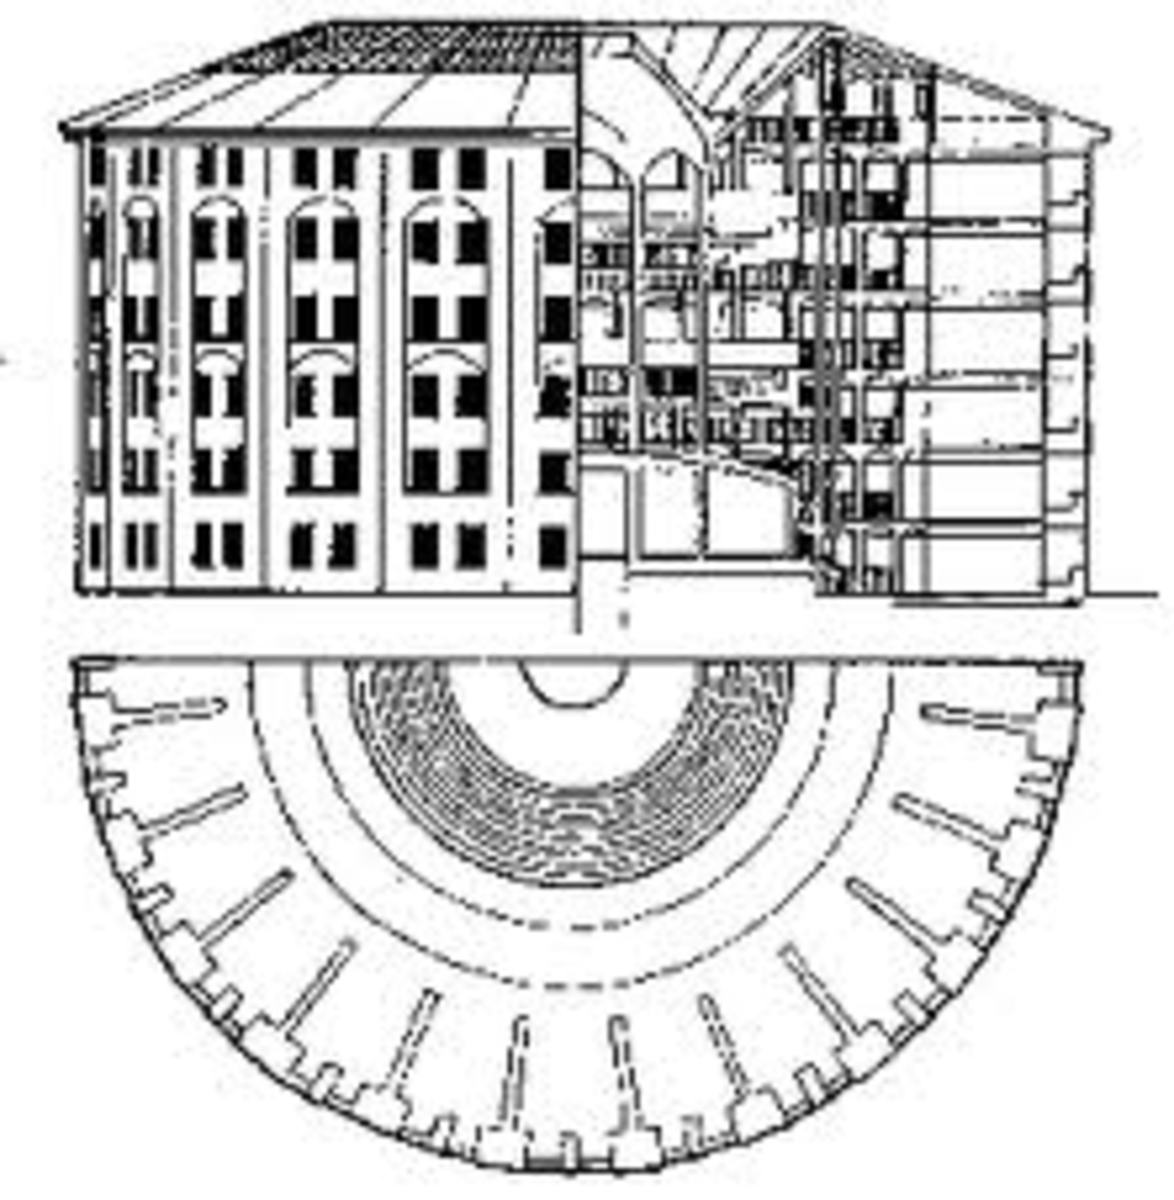 The panopticon diagram